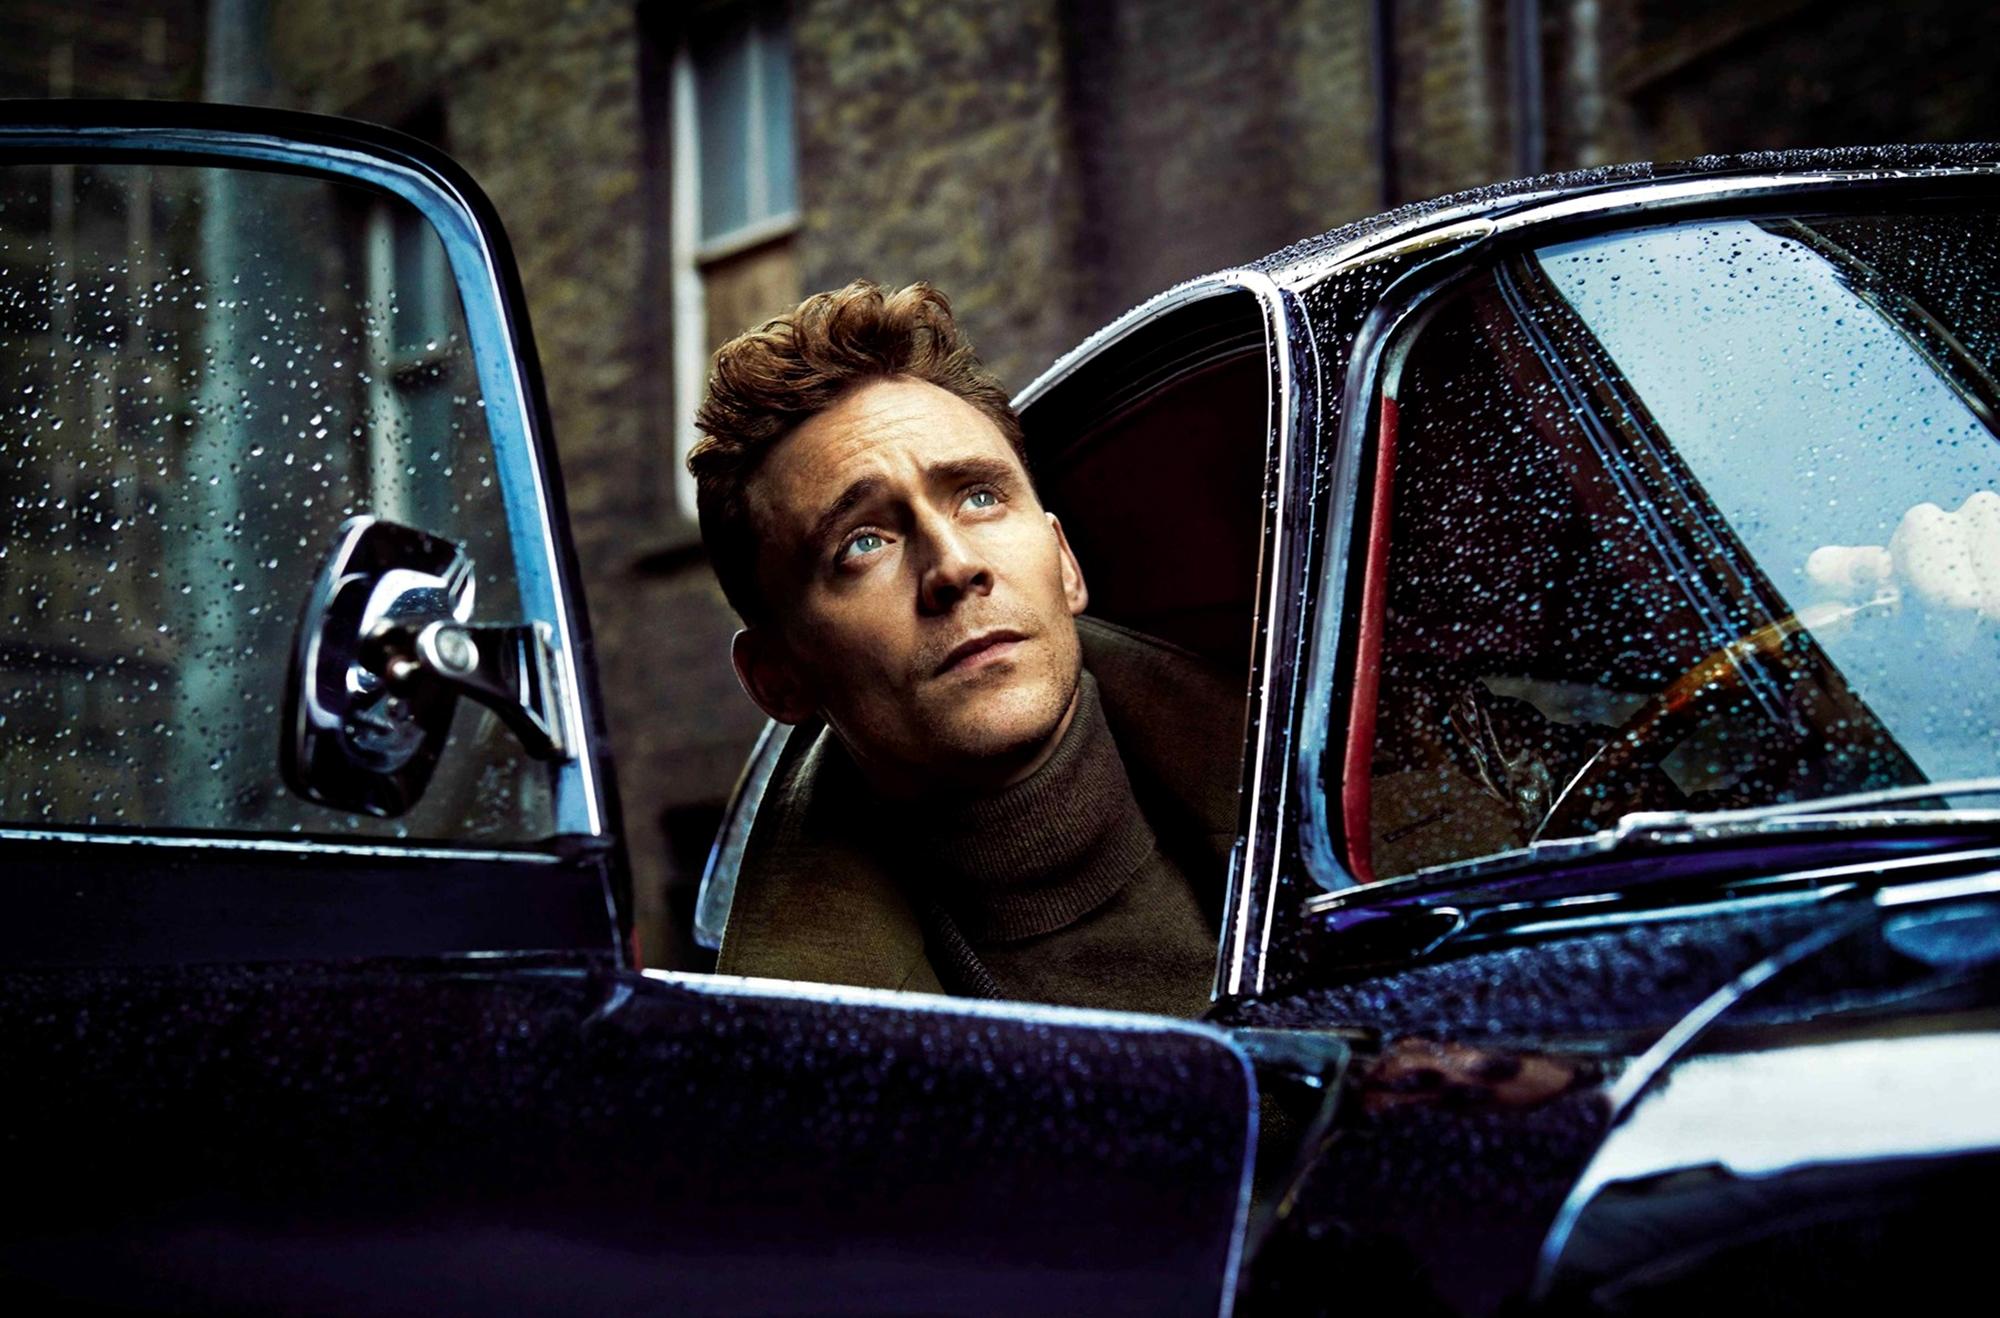 Tom Hiddleston Wallpapers Archives Hdwallsource Com